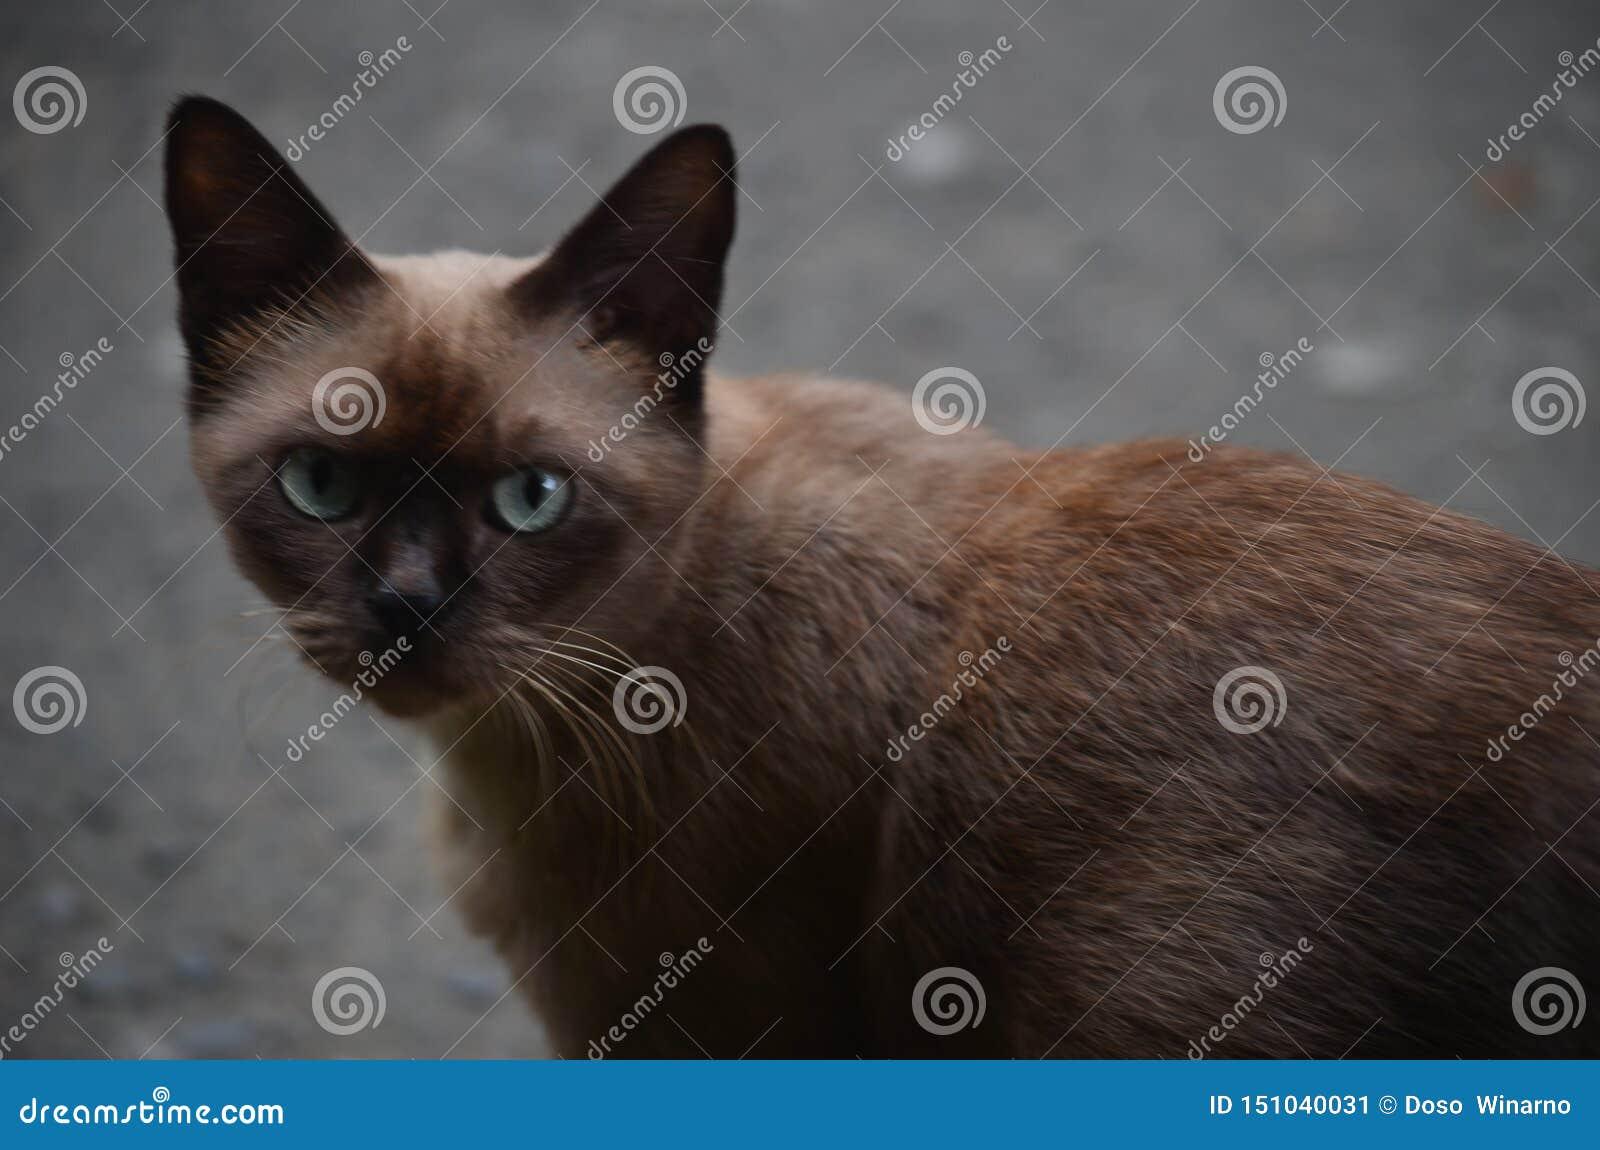 Brown-eyed cat bulging again wary of looking